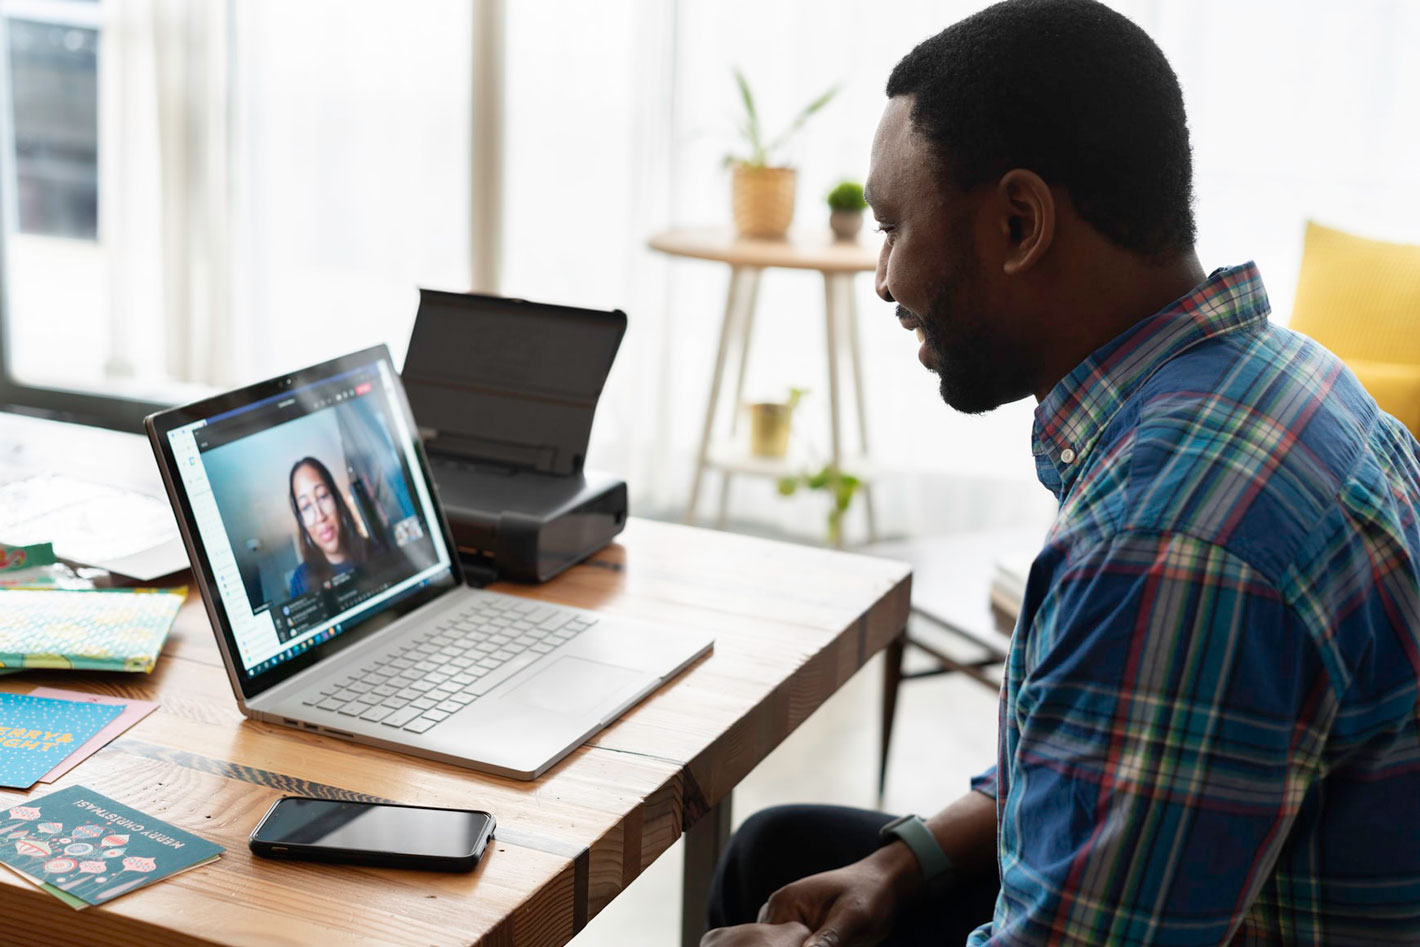 Couple Video Call